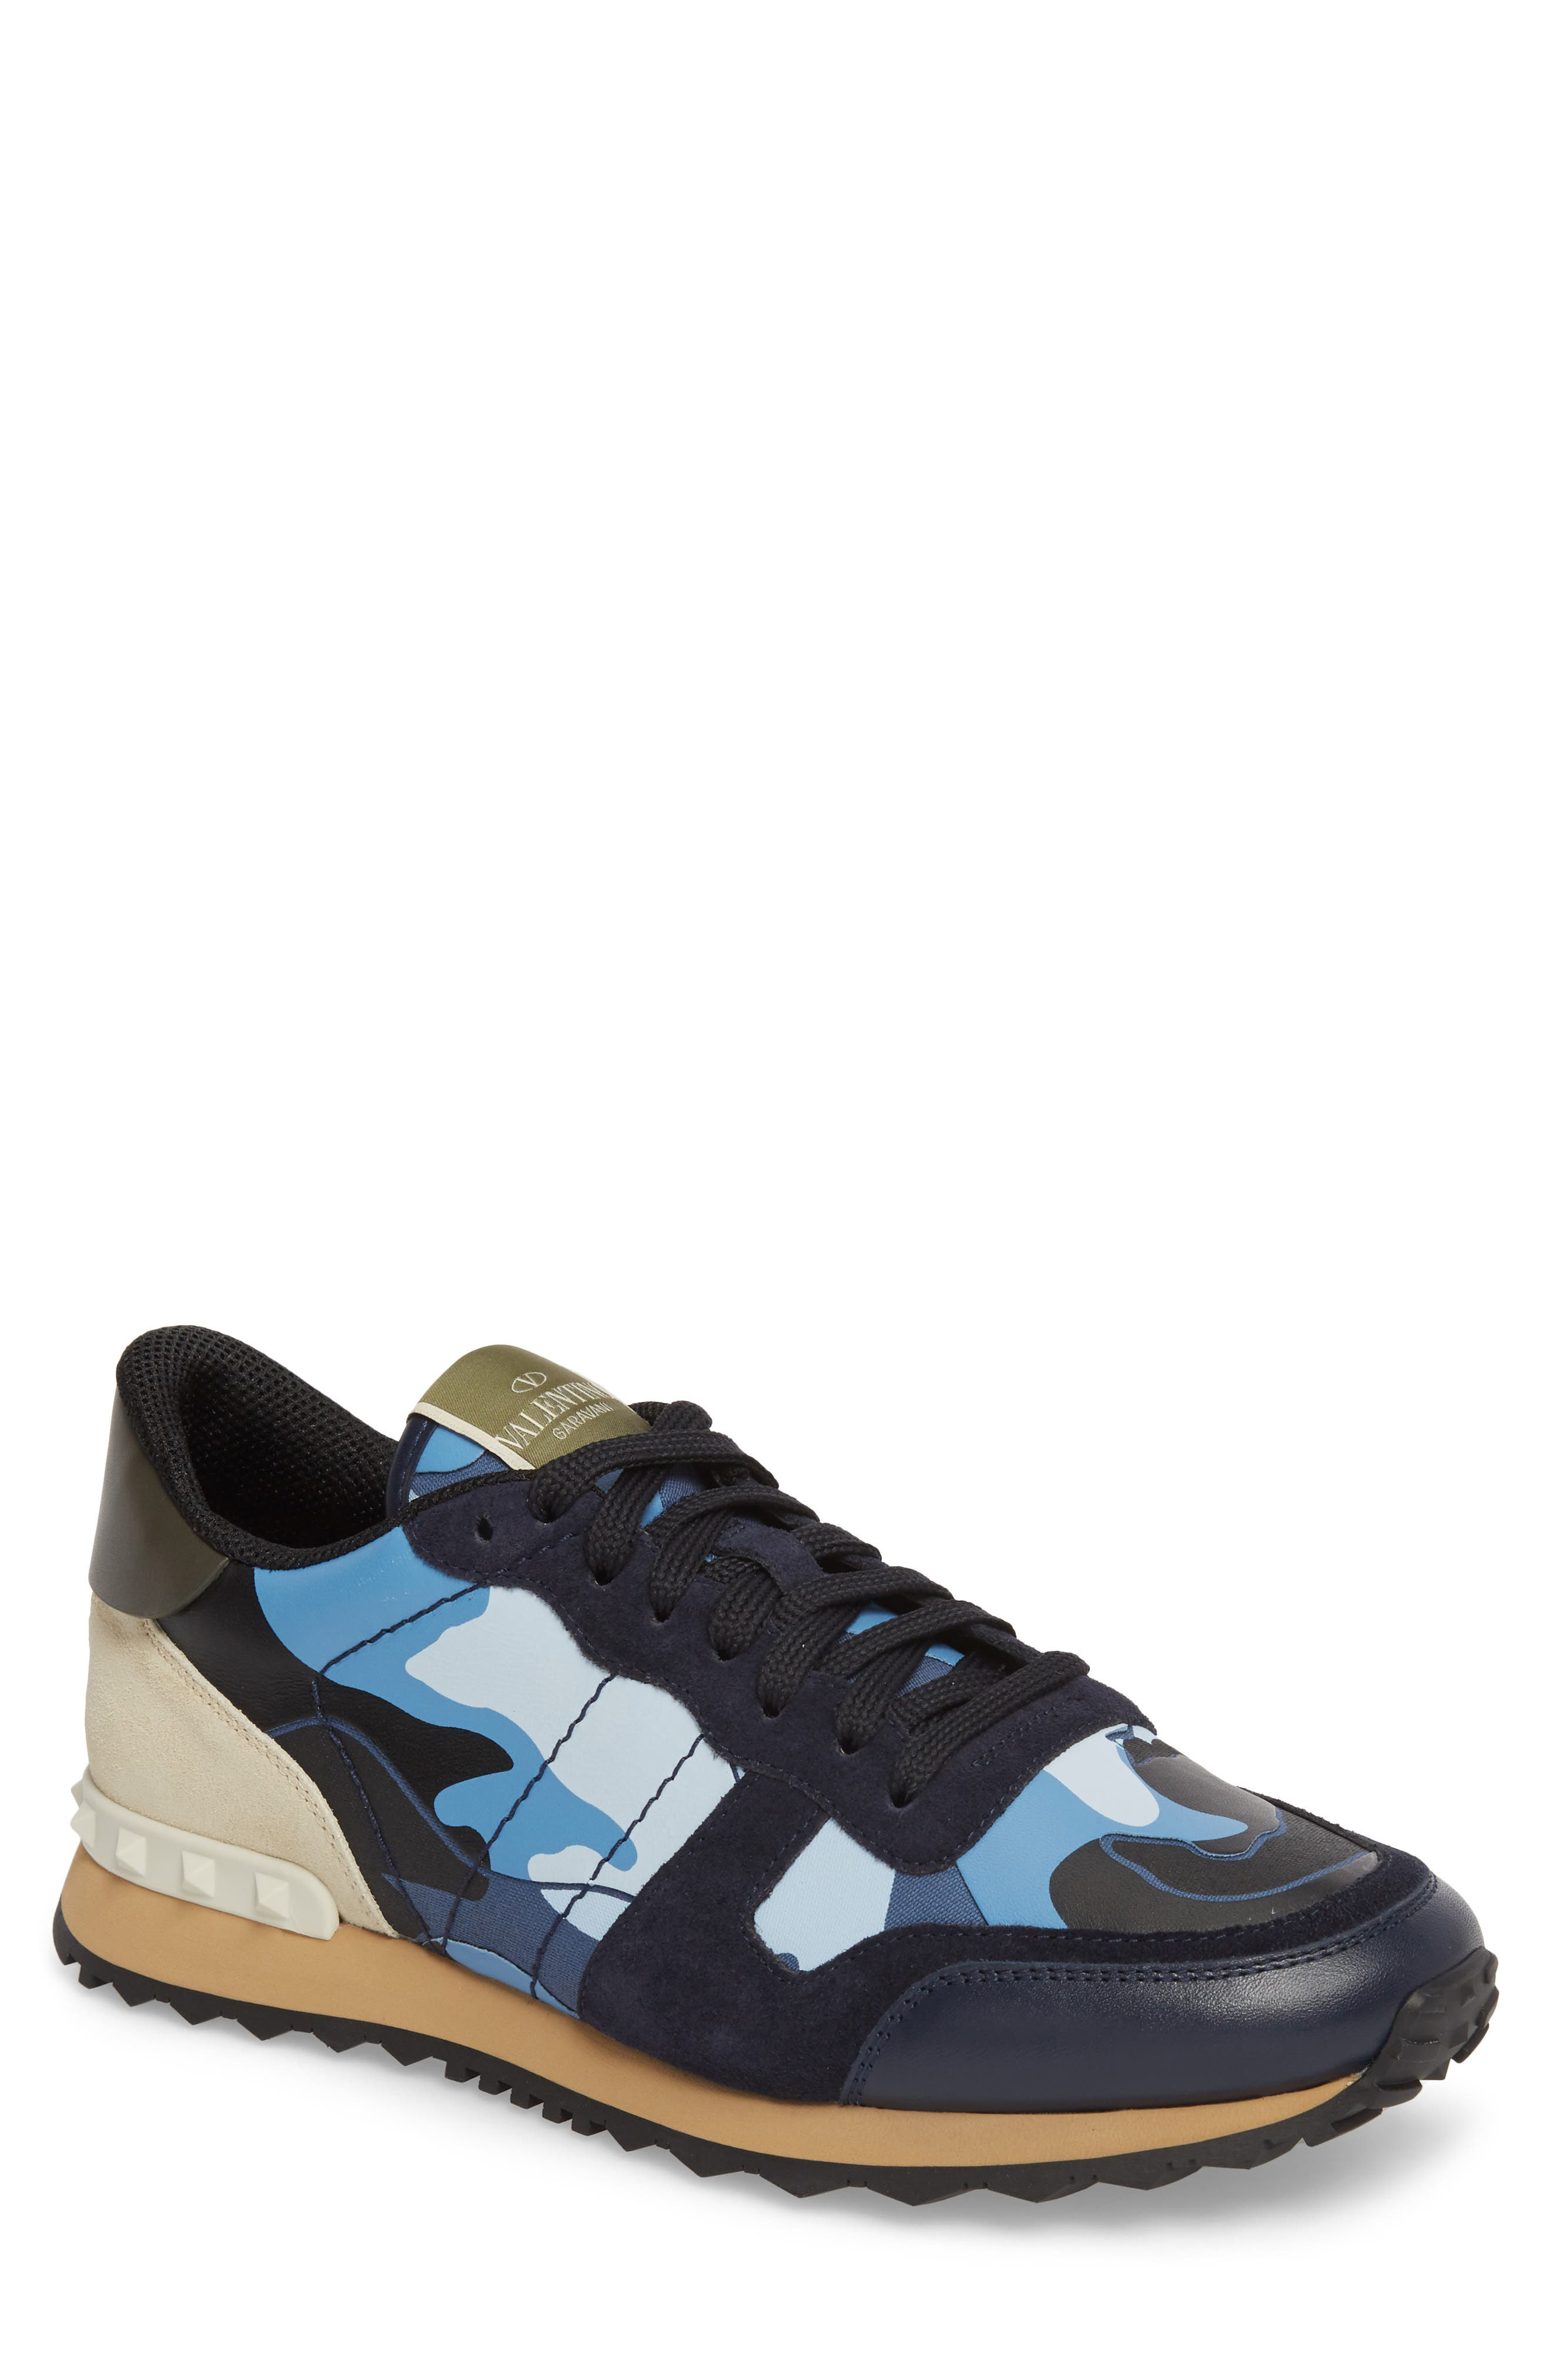 VALENTINO GARAVANI Camo Rockrunner Sneaker (Men)